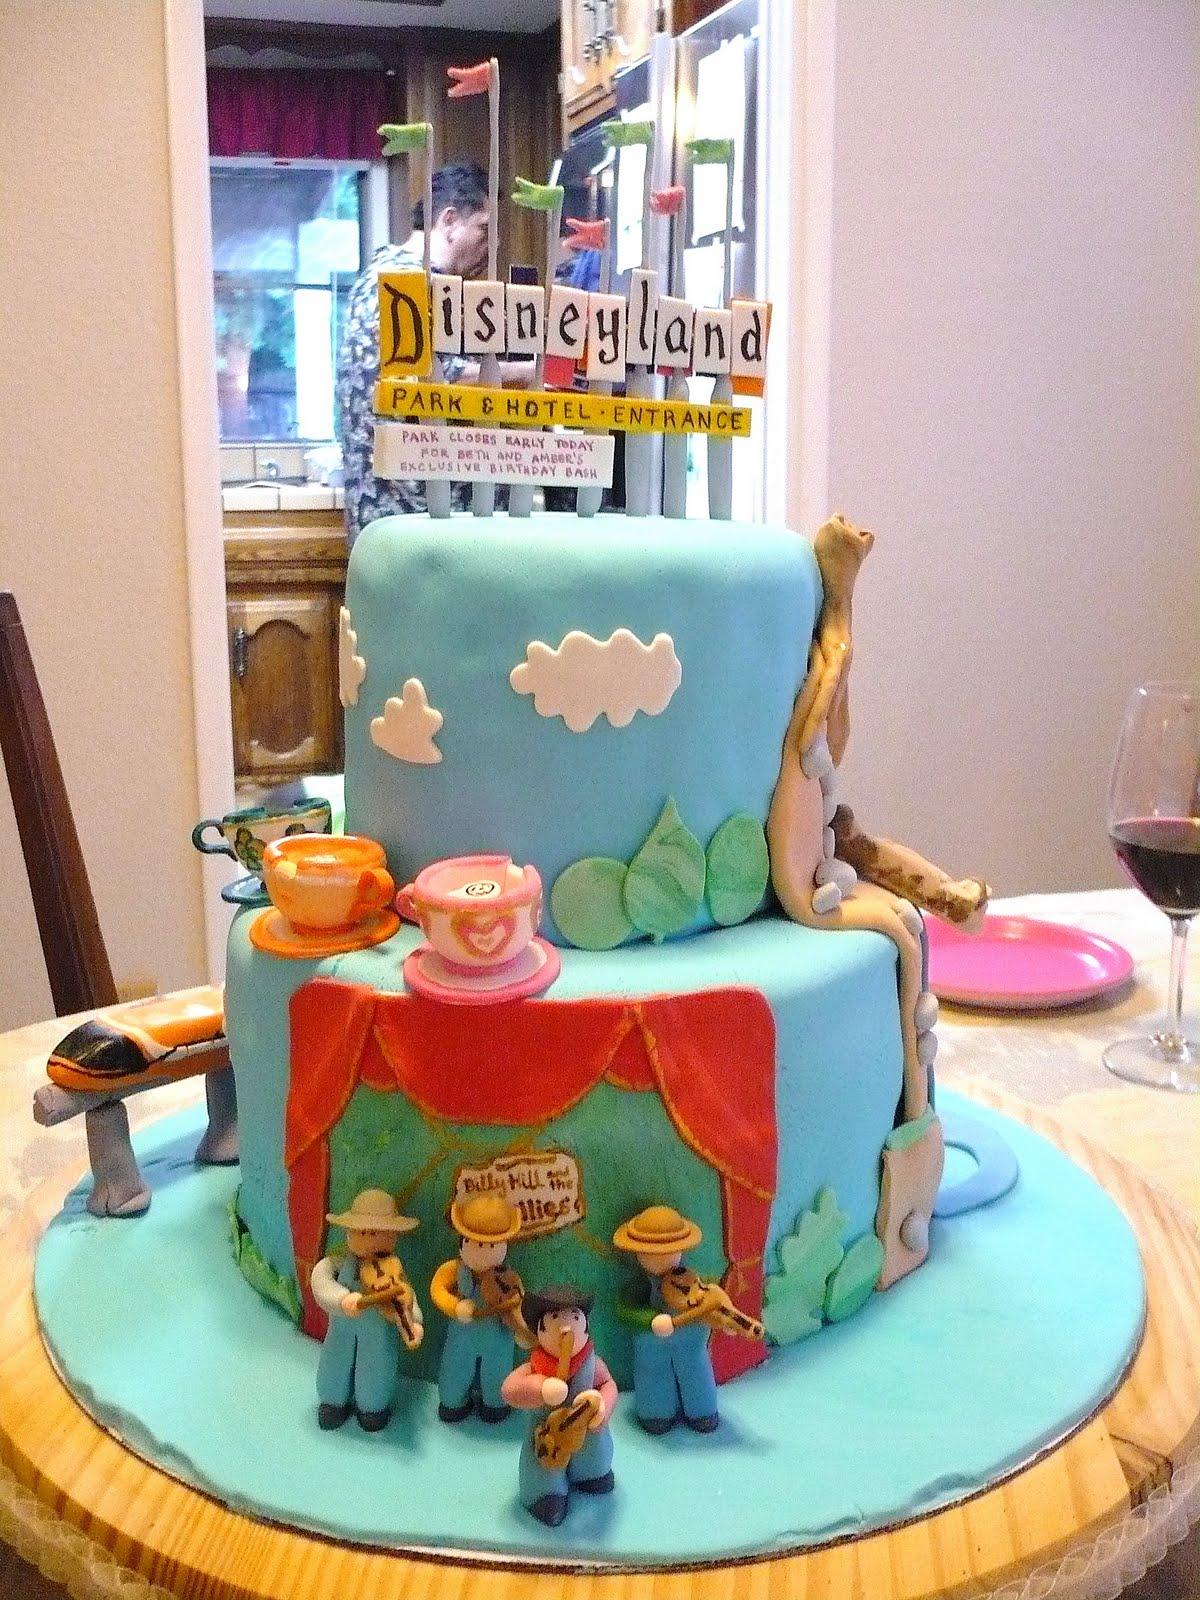 Disneyland Cake Images : The Wright Report: DISNEYLAND CAKE!